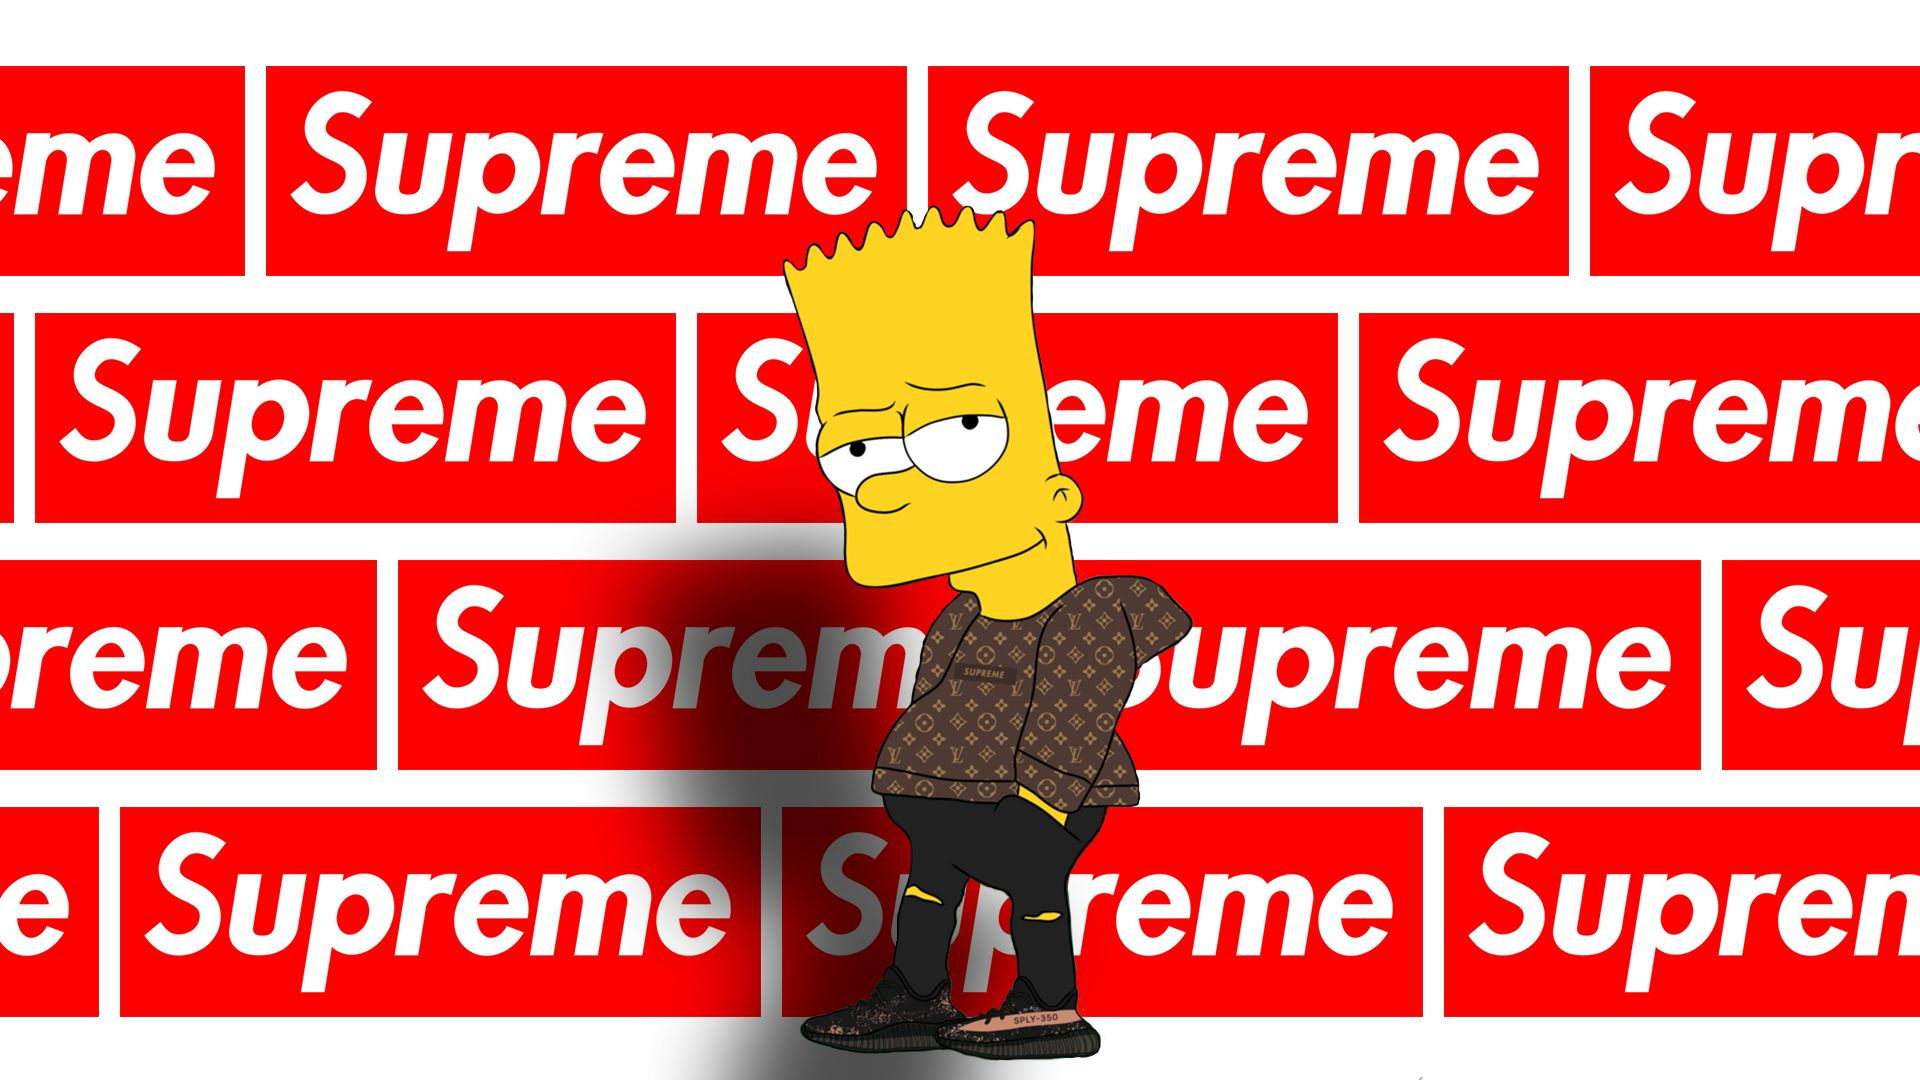 Supreme Bart Simpson Wallpapers   Top Supreme Bart Simpson 1920x1080